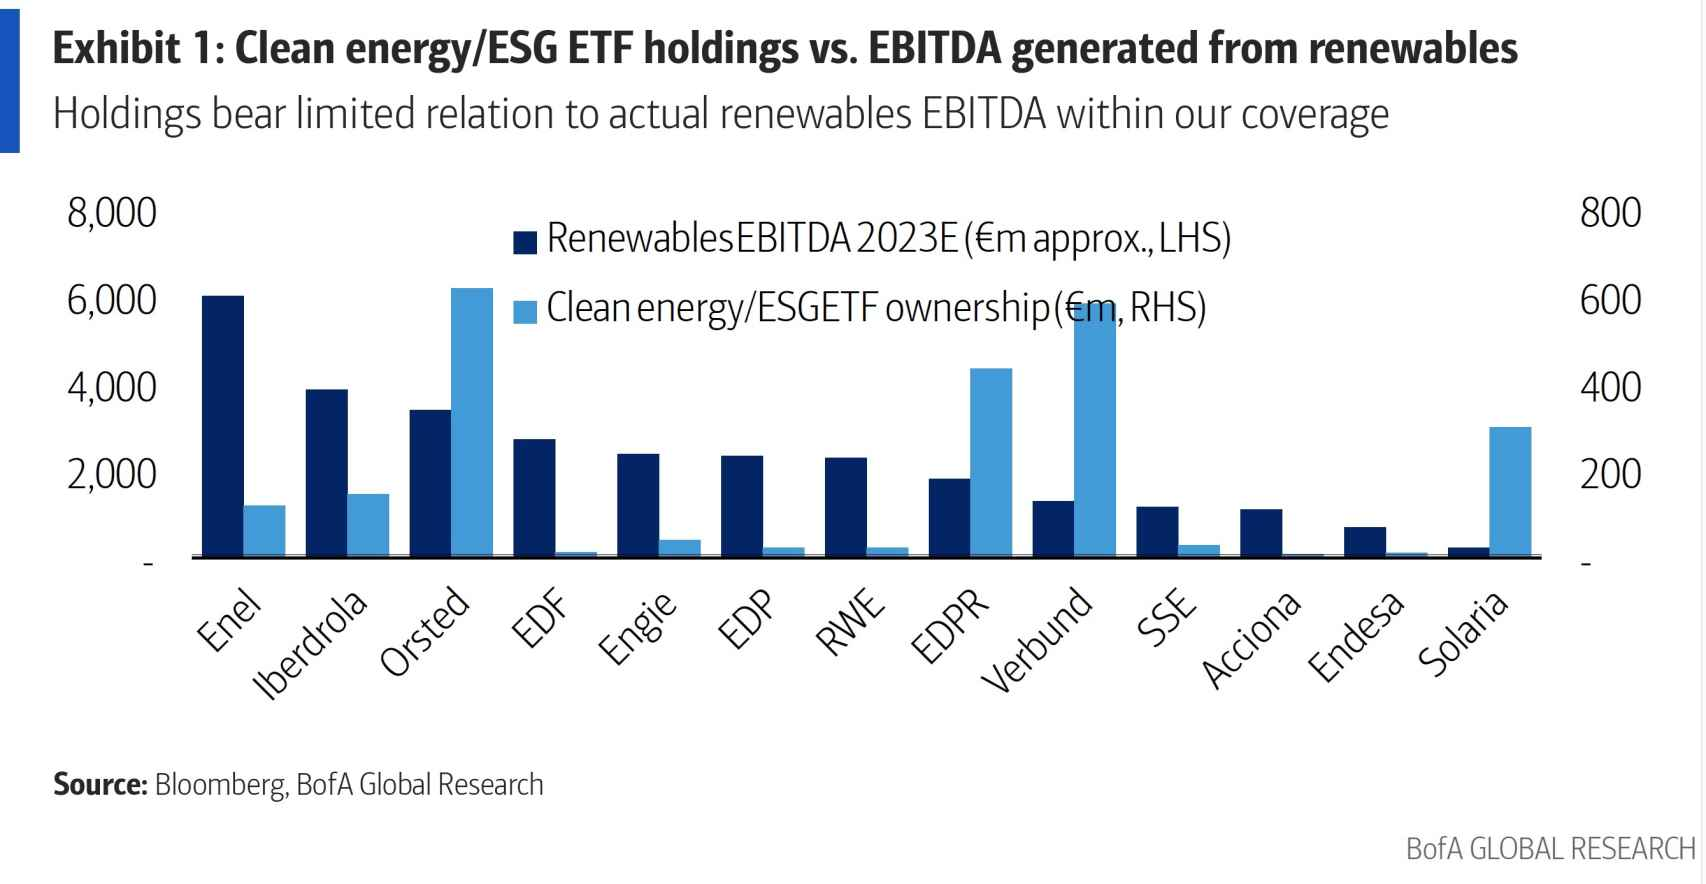 Comparativa EBITDA vs. Clean Energy/ESG ETF